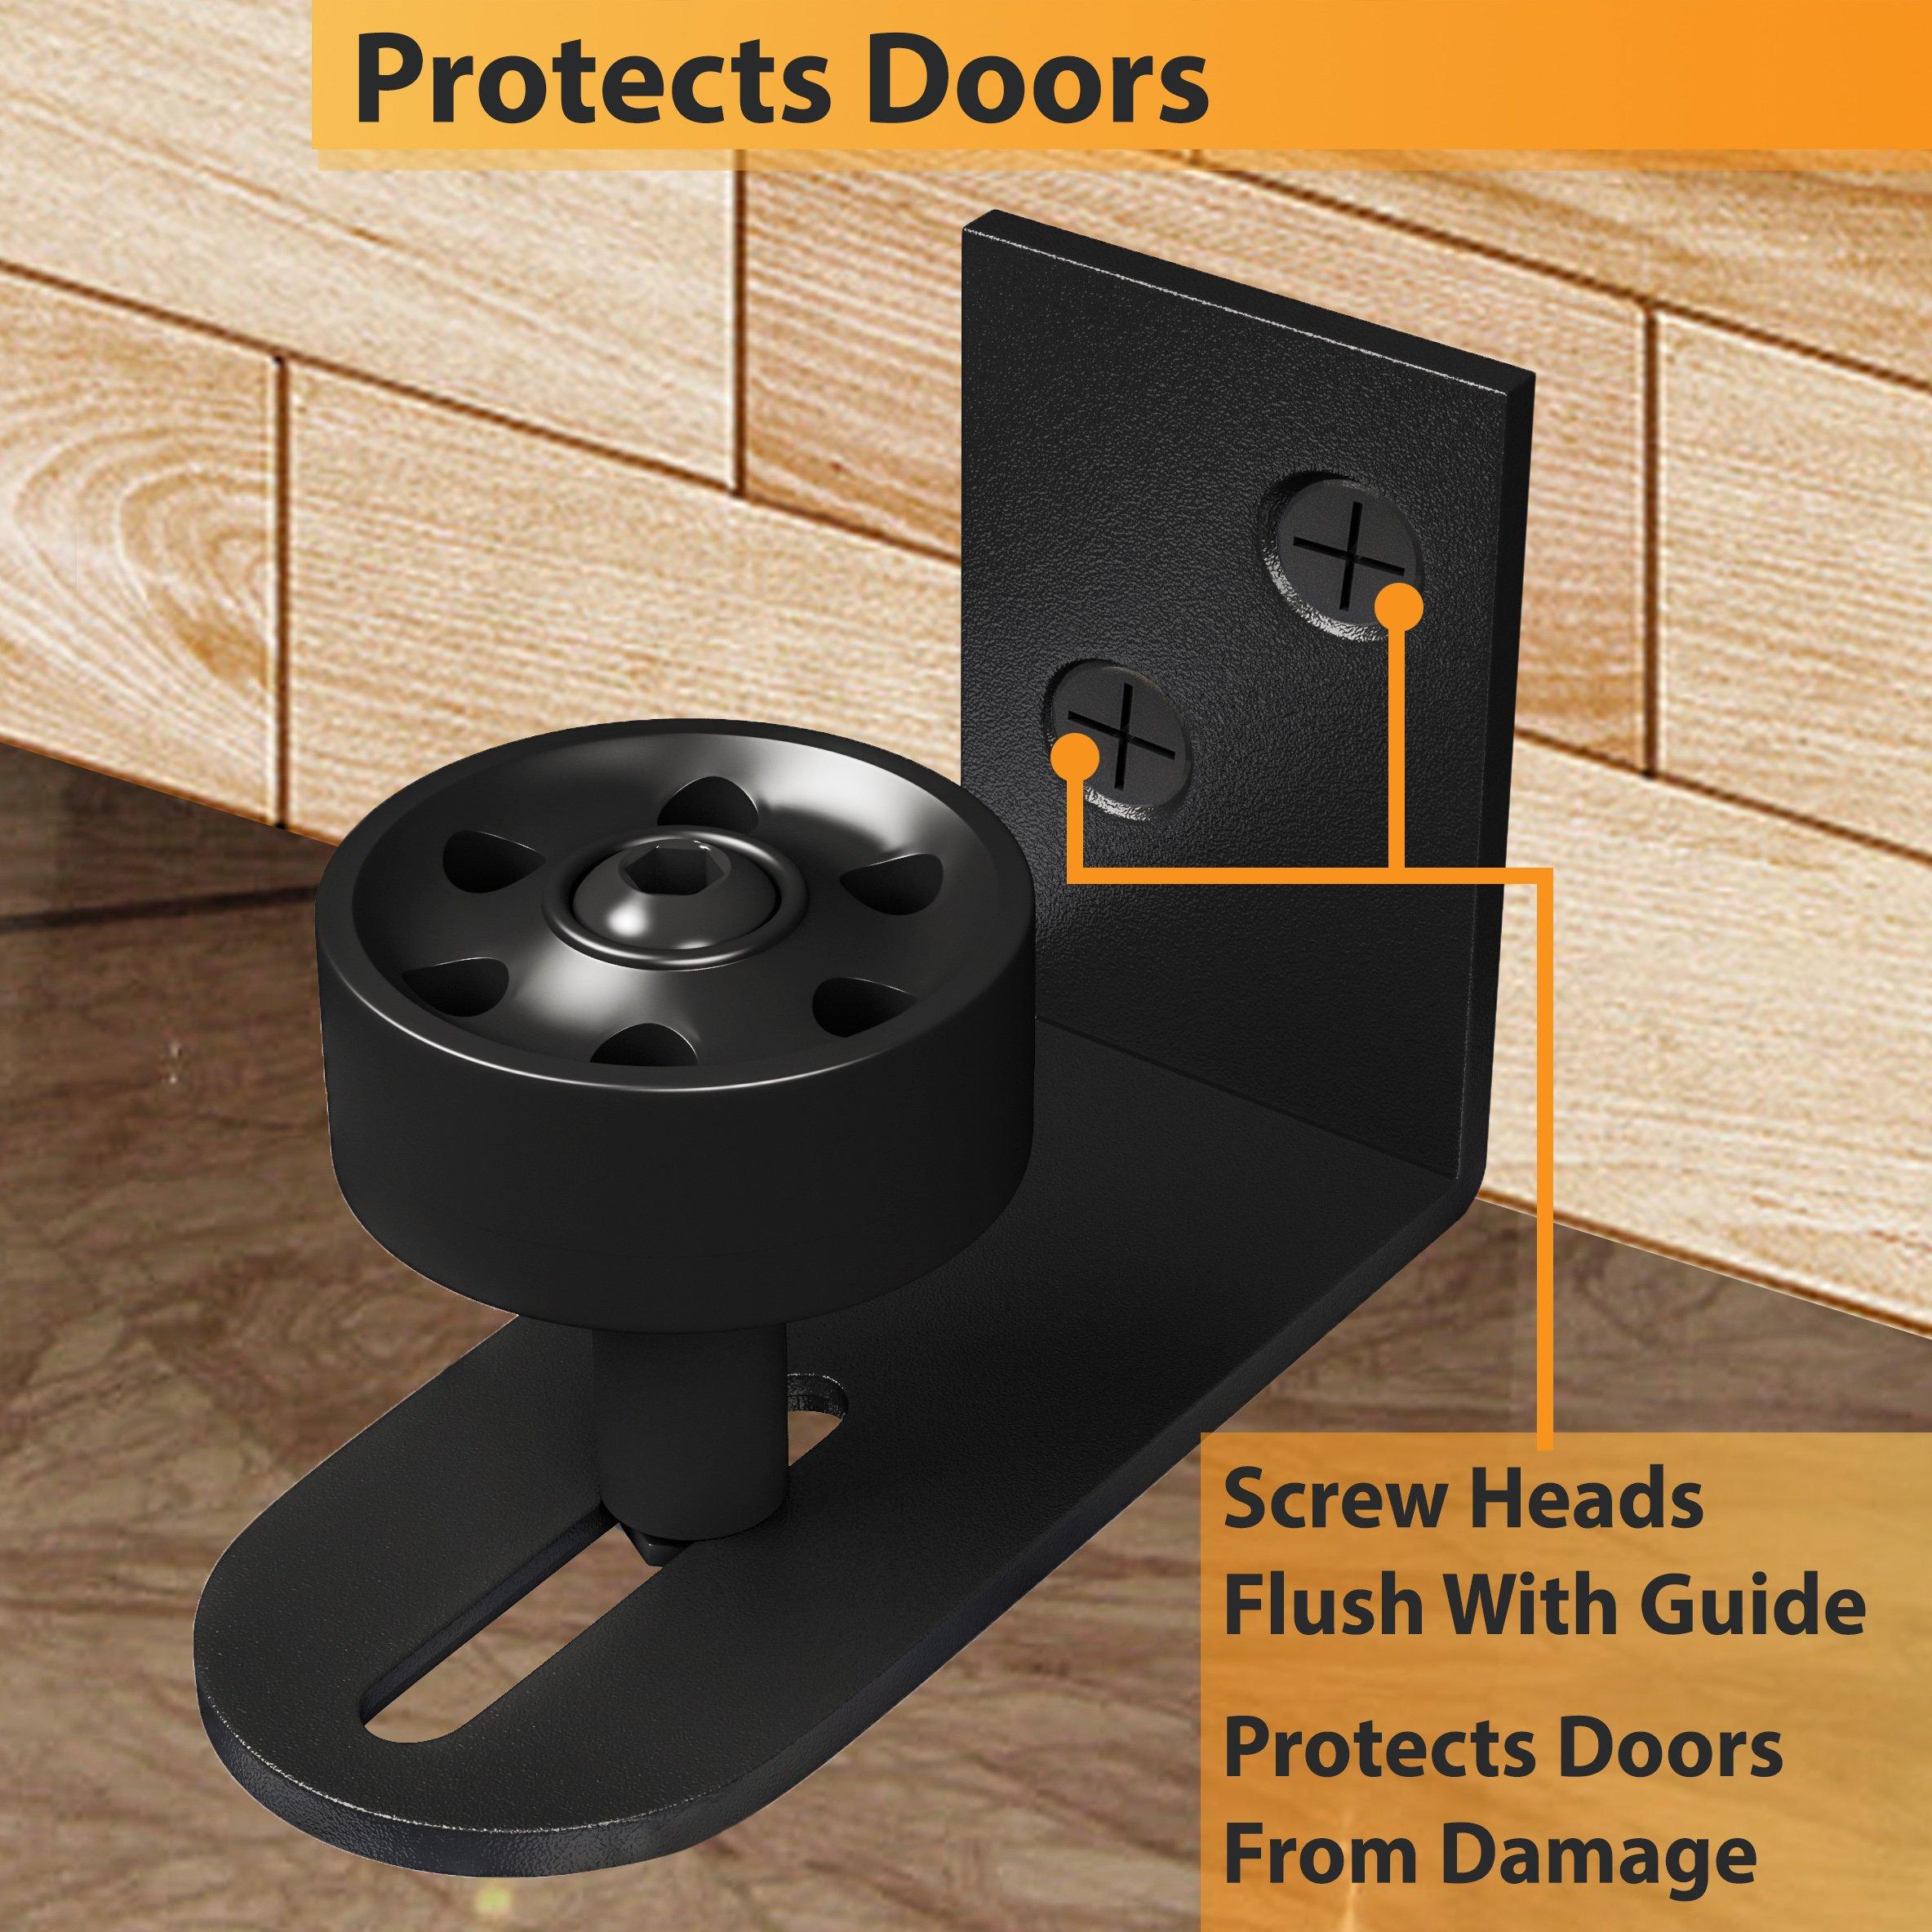 Barn Door Floor Guides with''Ball Bearings'' | Adjustable Stay Roller  Bottom Sliding Doors | Wall Mounted Bracket Flat on Floor | All Black  Hardware